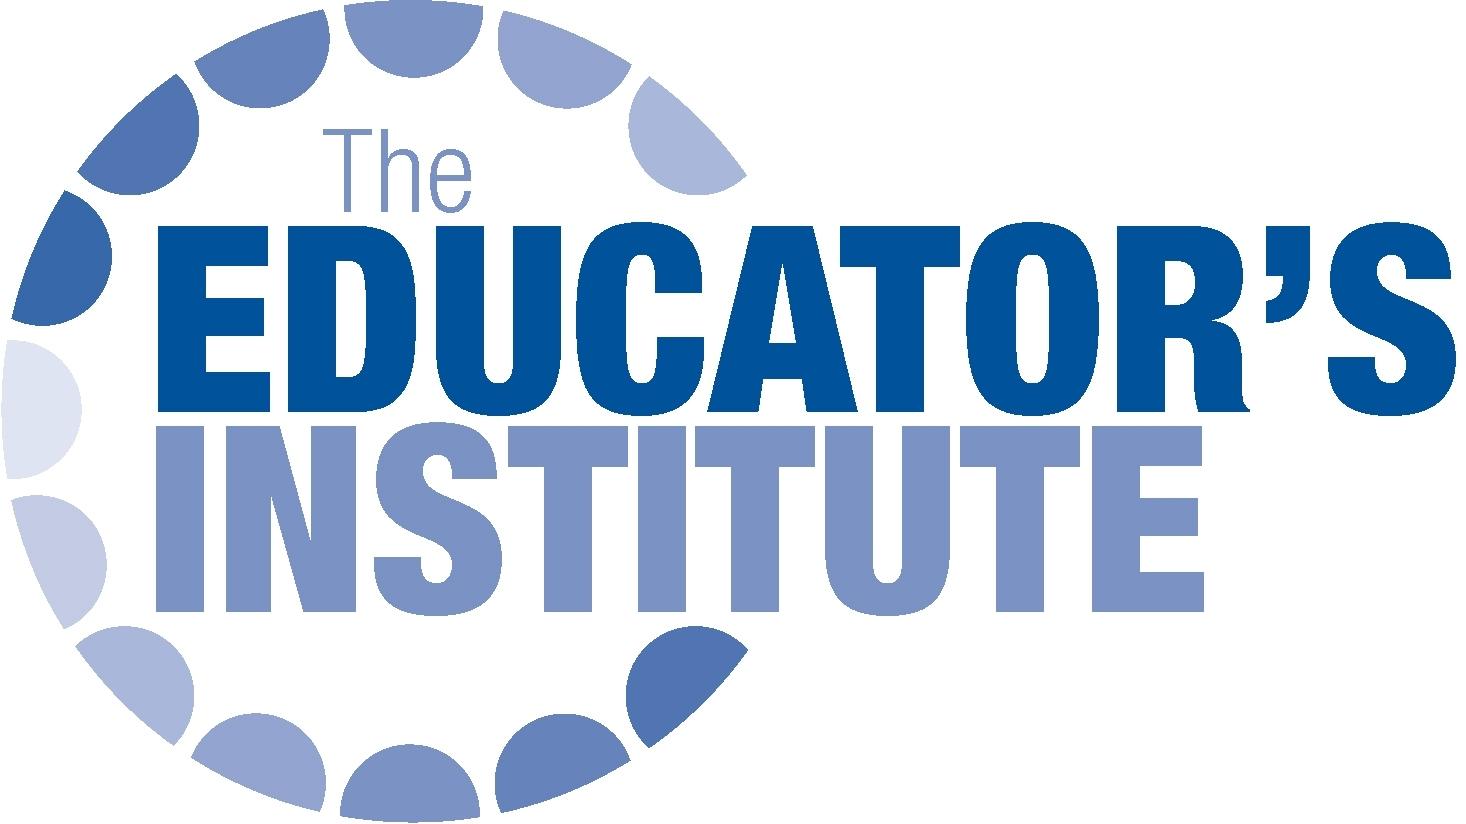 feb403f51d26f0c26e5f_educatorsinstitutecolor.jpg